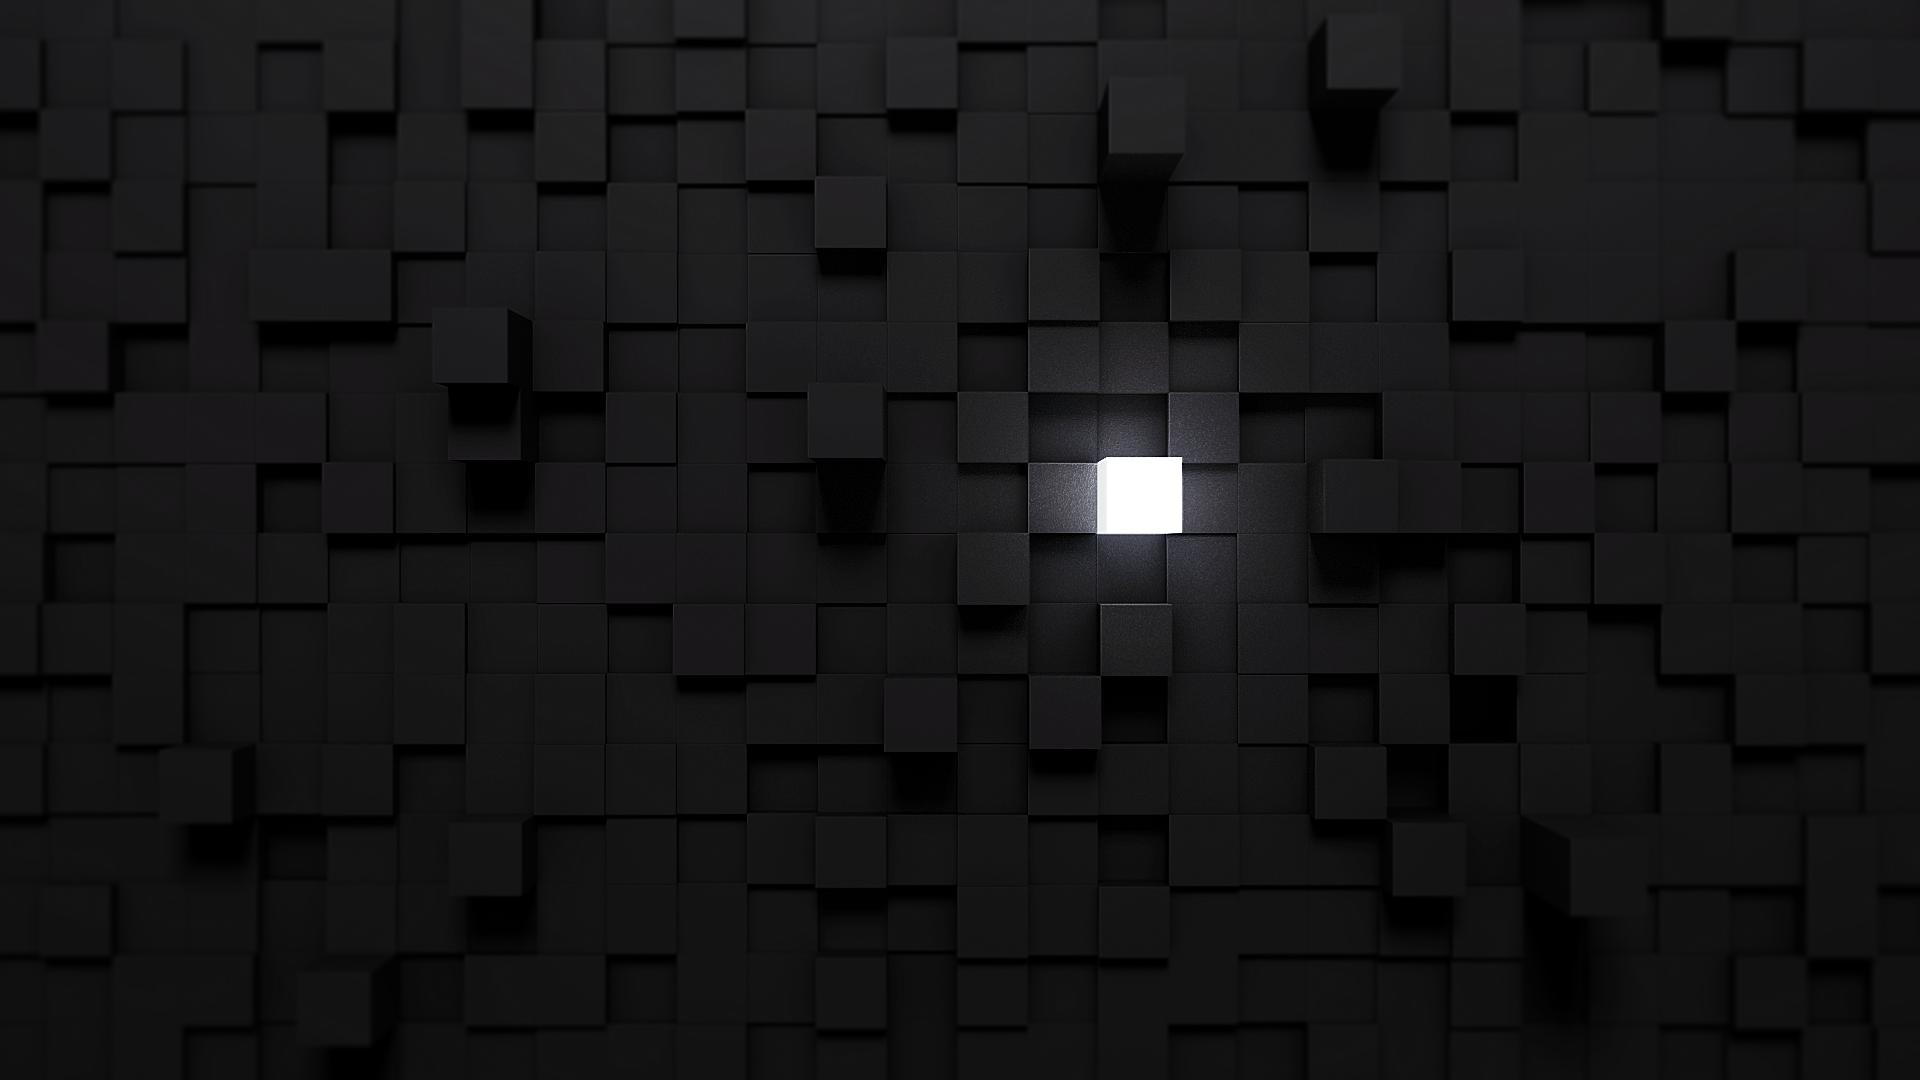 Wallpaper : lights, white, black, monochrome, minimalism, symmetry, cube, pattern, texture ...